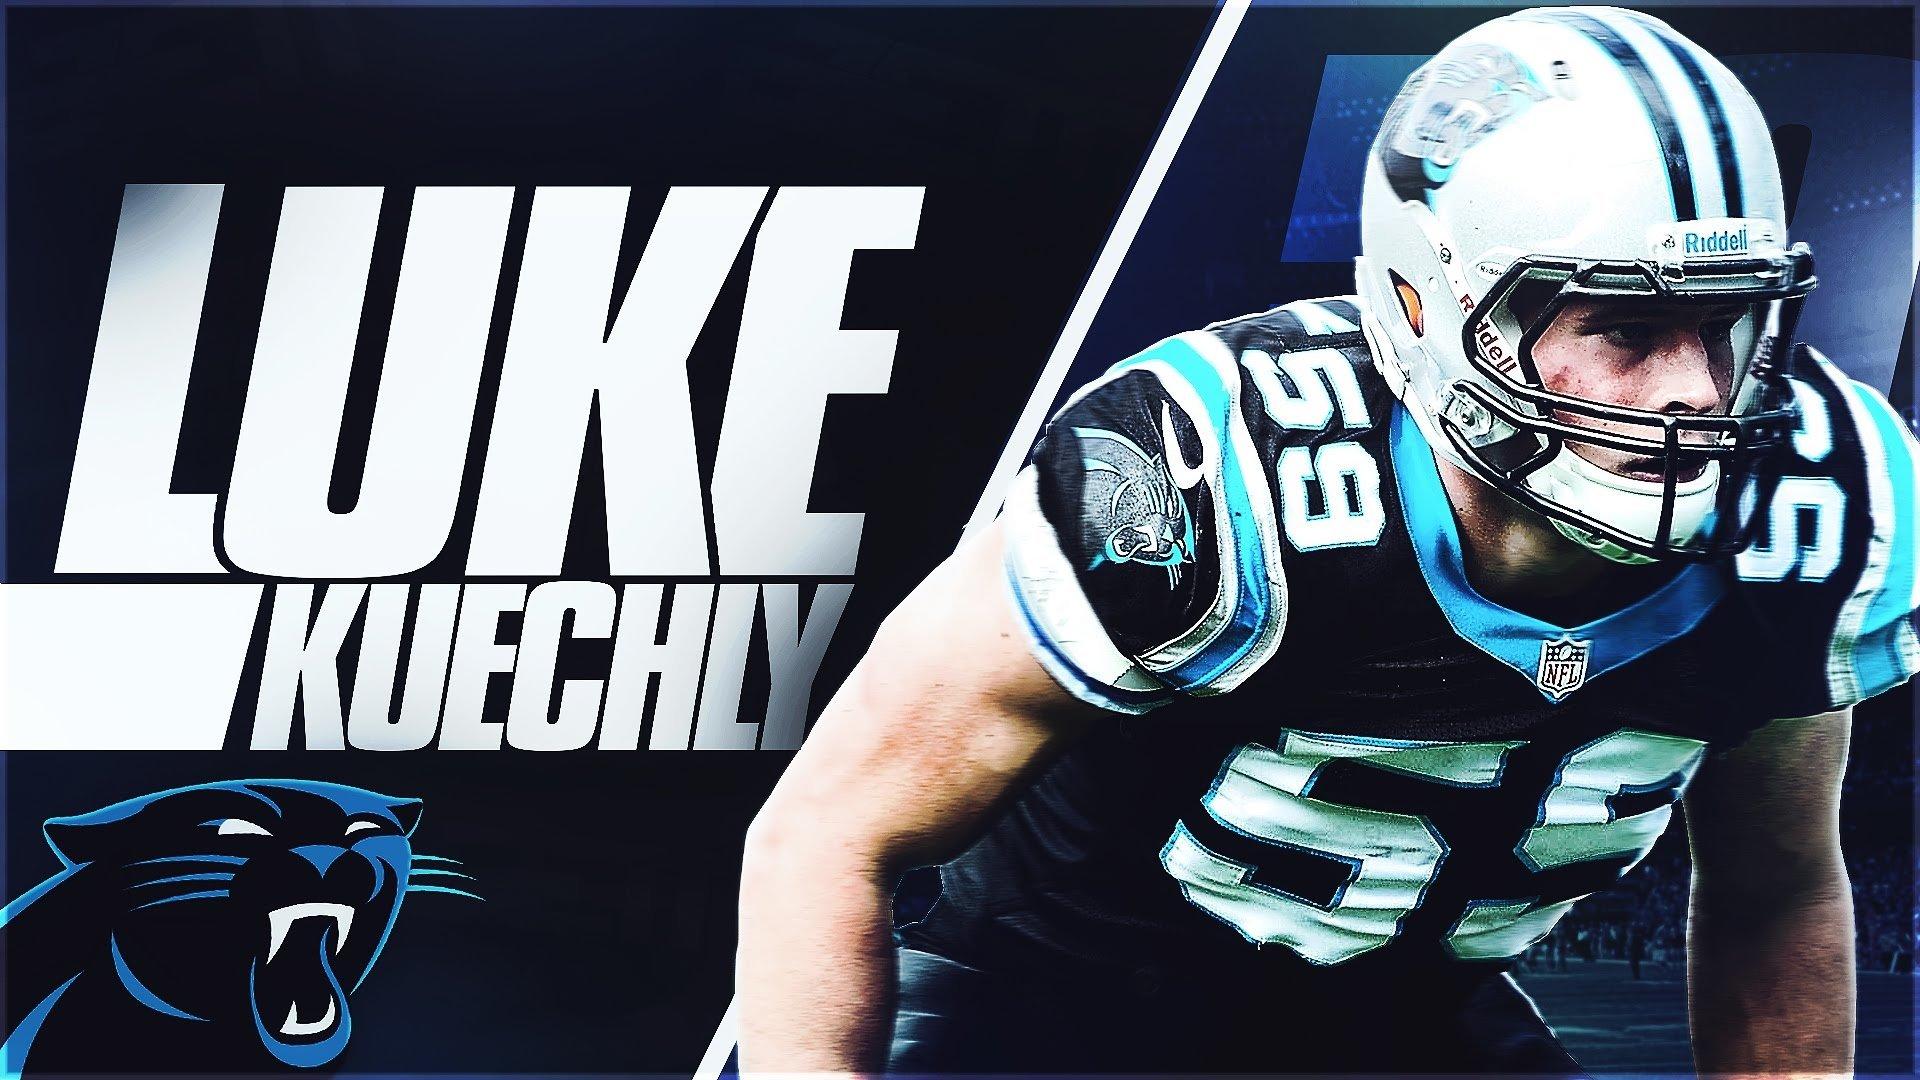 Luke Kuechly HD Wallpaper